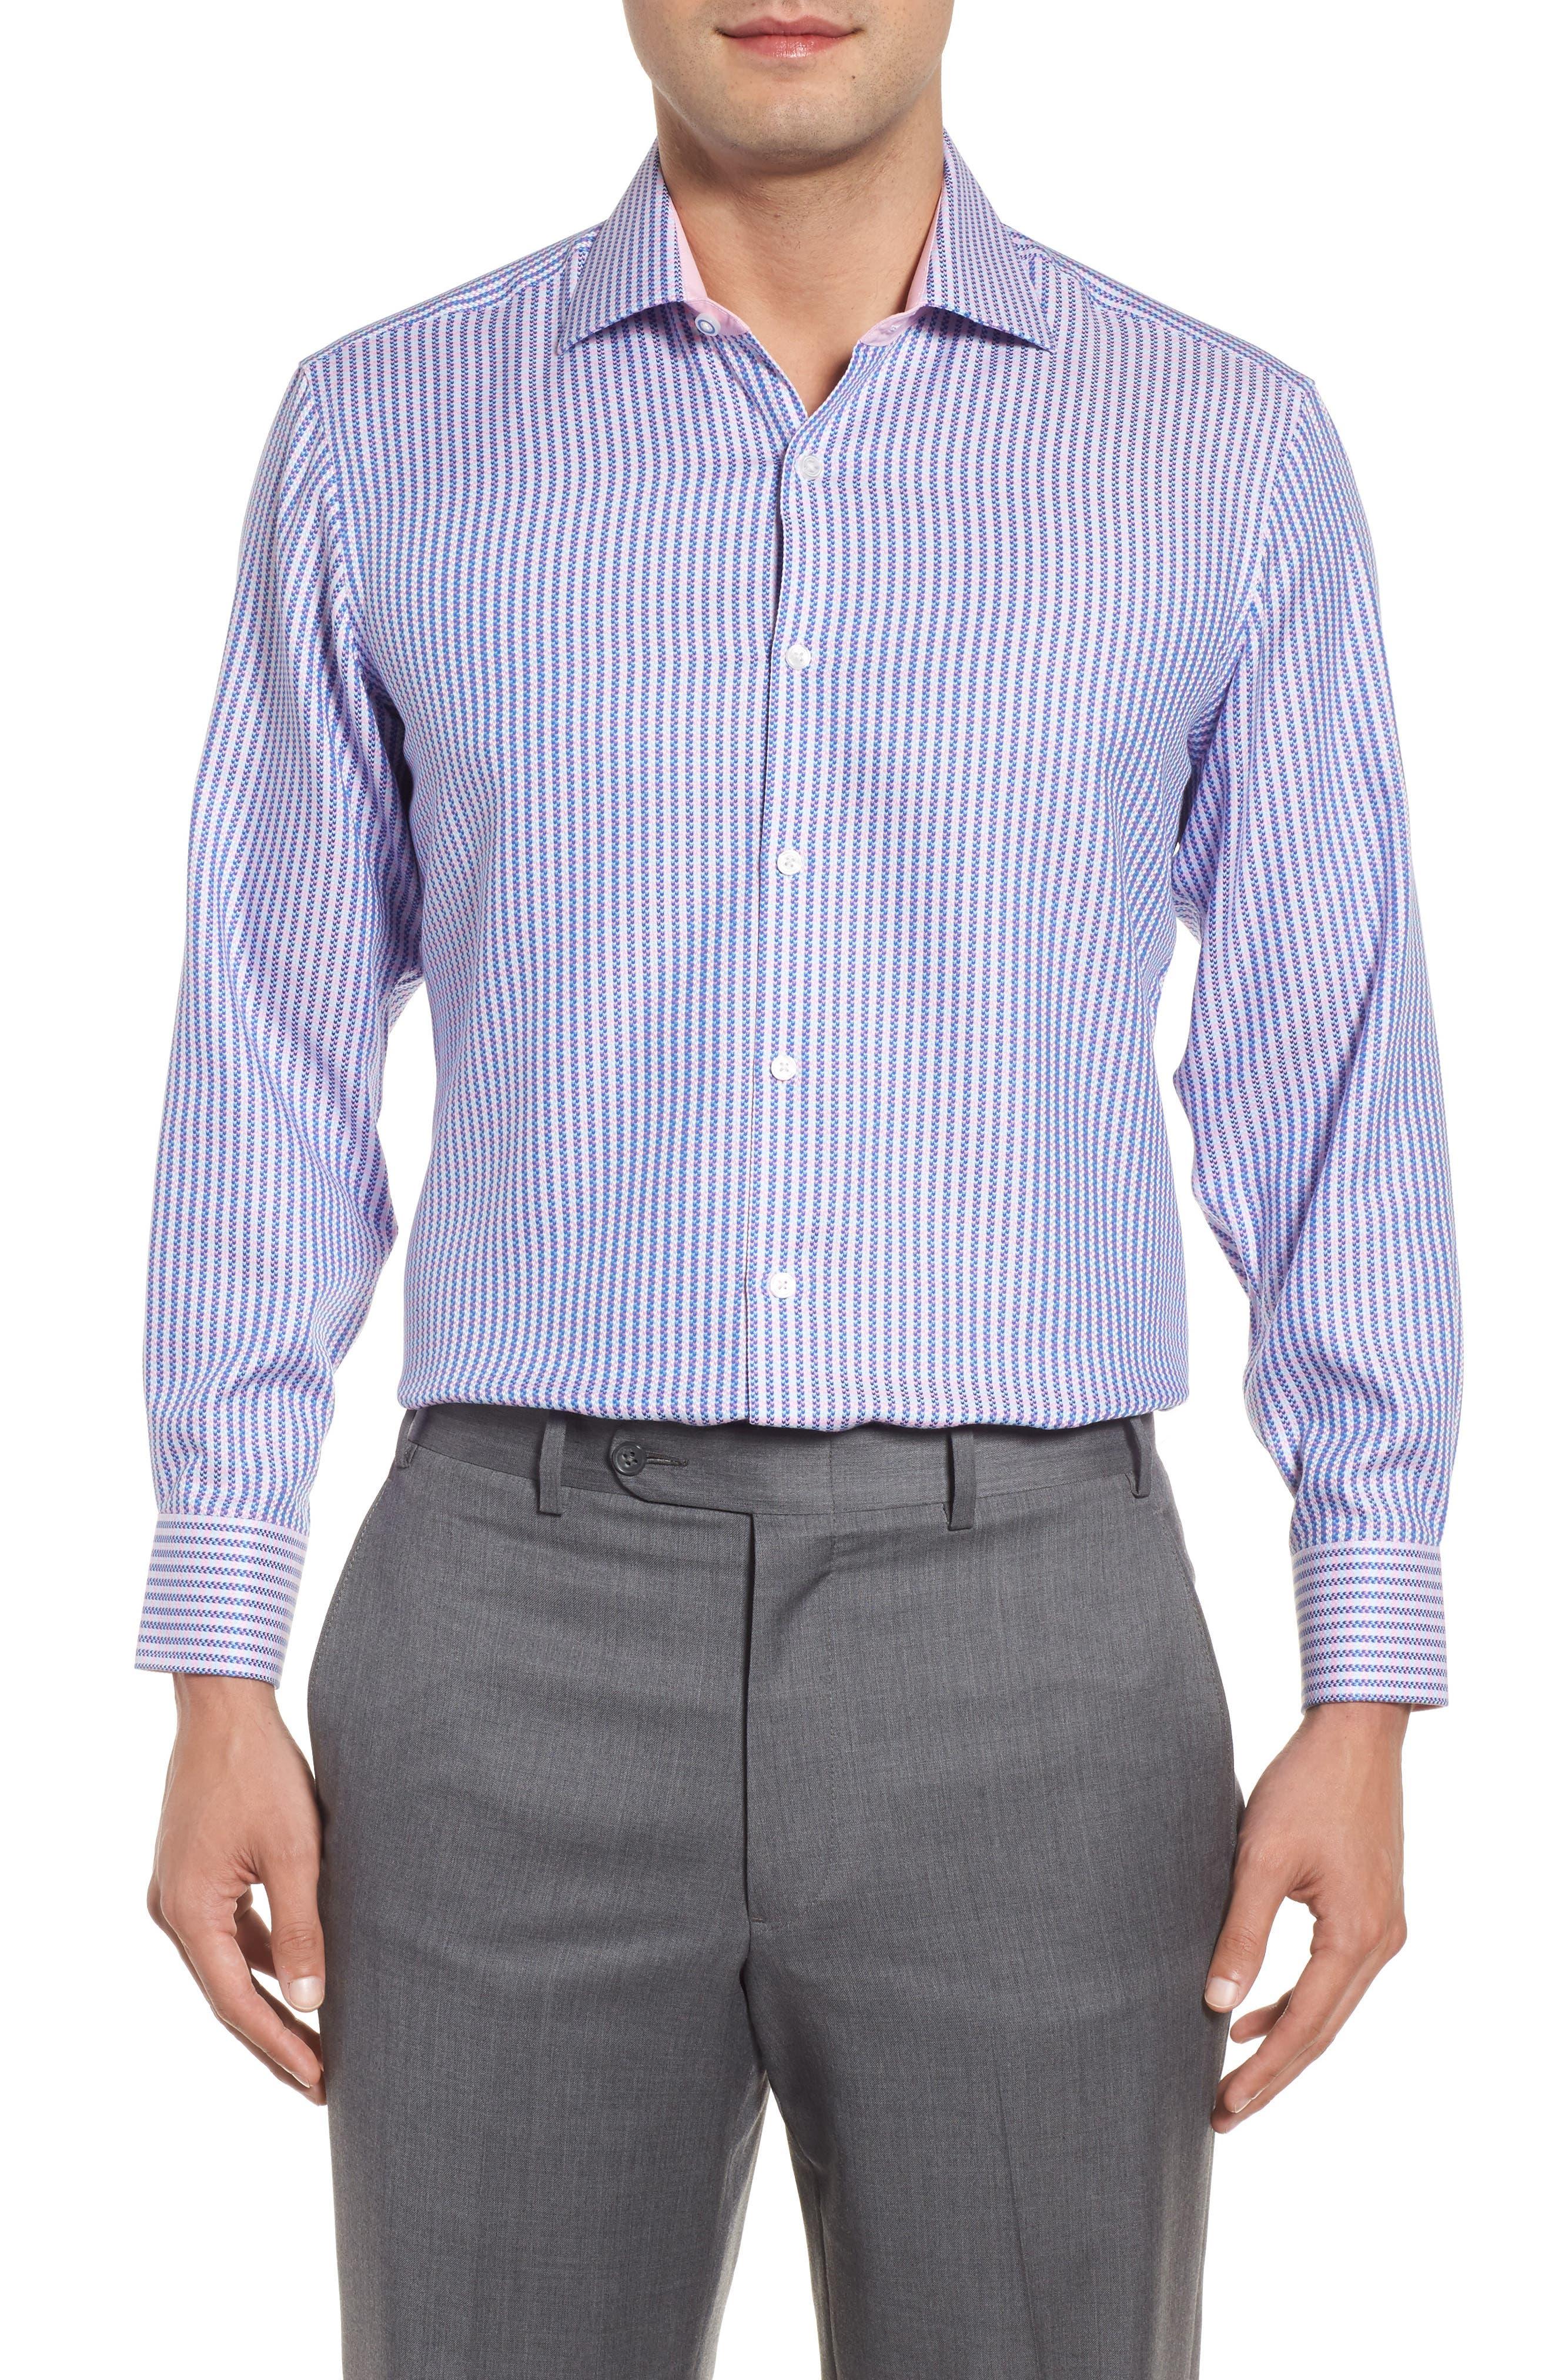 Trim Fit Stripe Dress Shirt,                             Main thumbnail 1, color,                             650